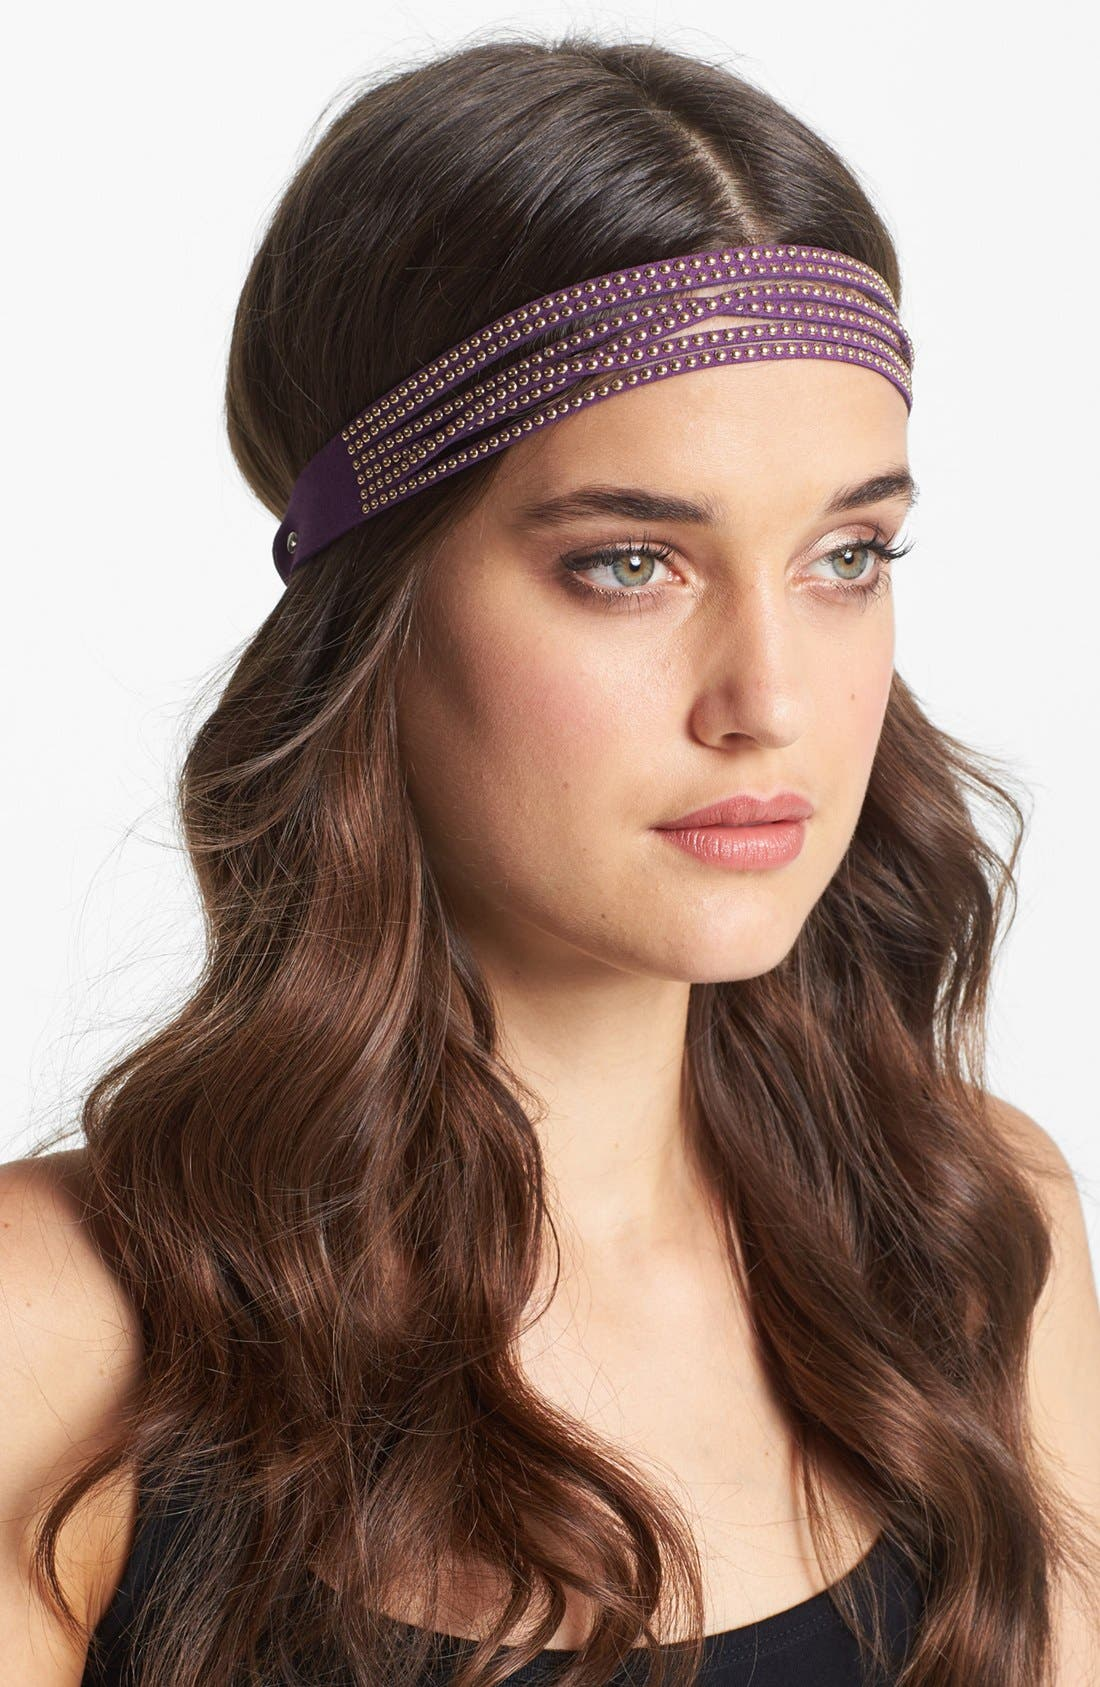 Alternate Image 1 Selected - Tasha 'Studly' Suede Head Wrap